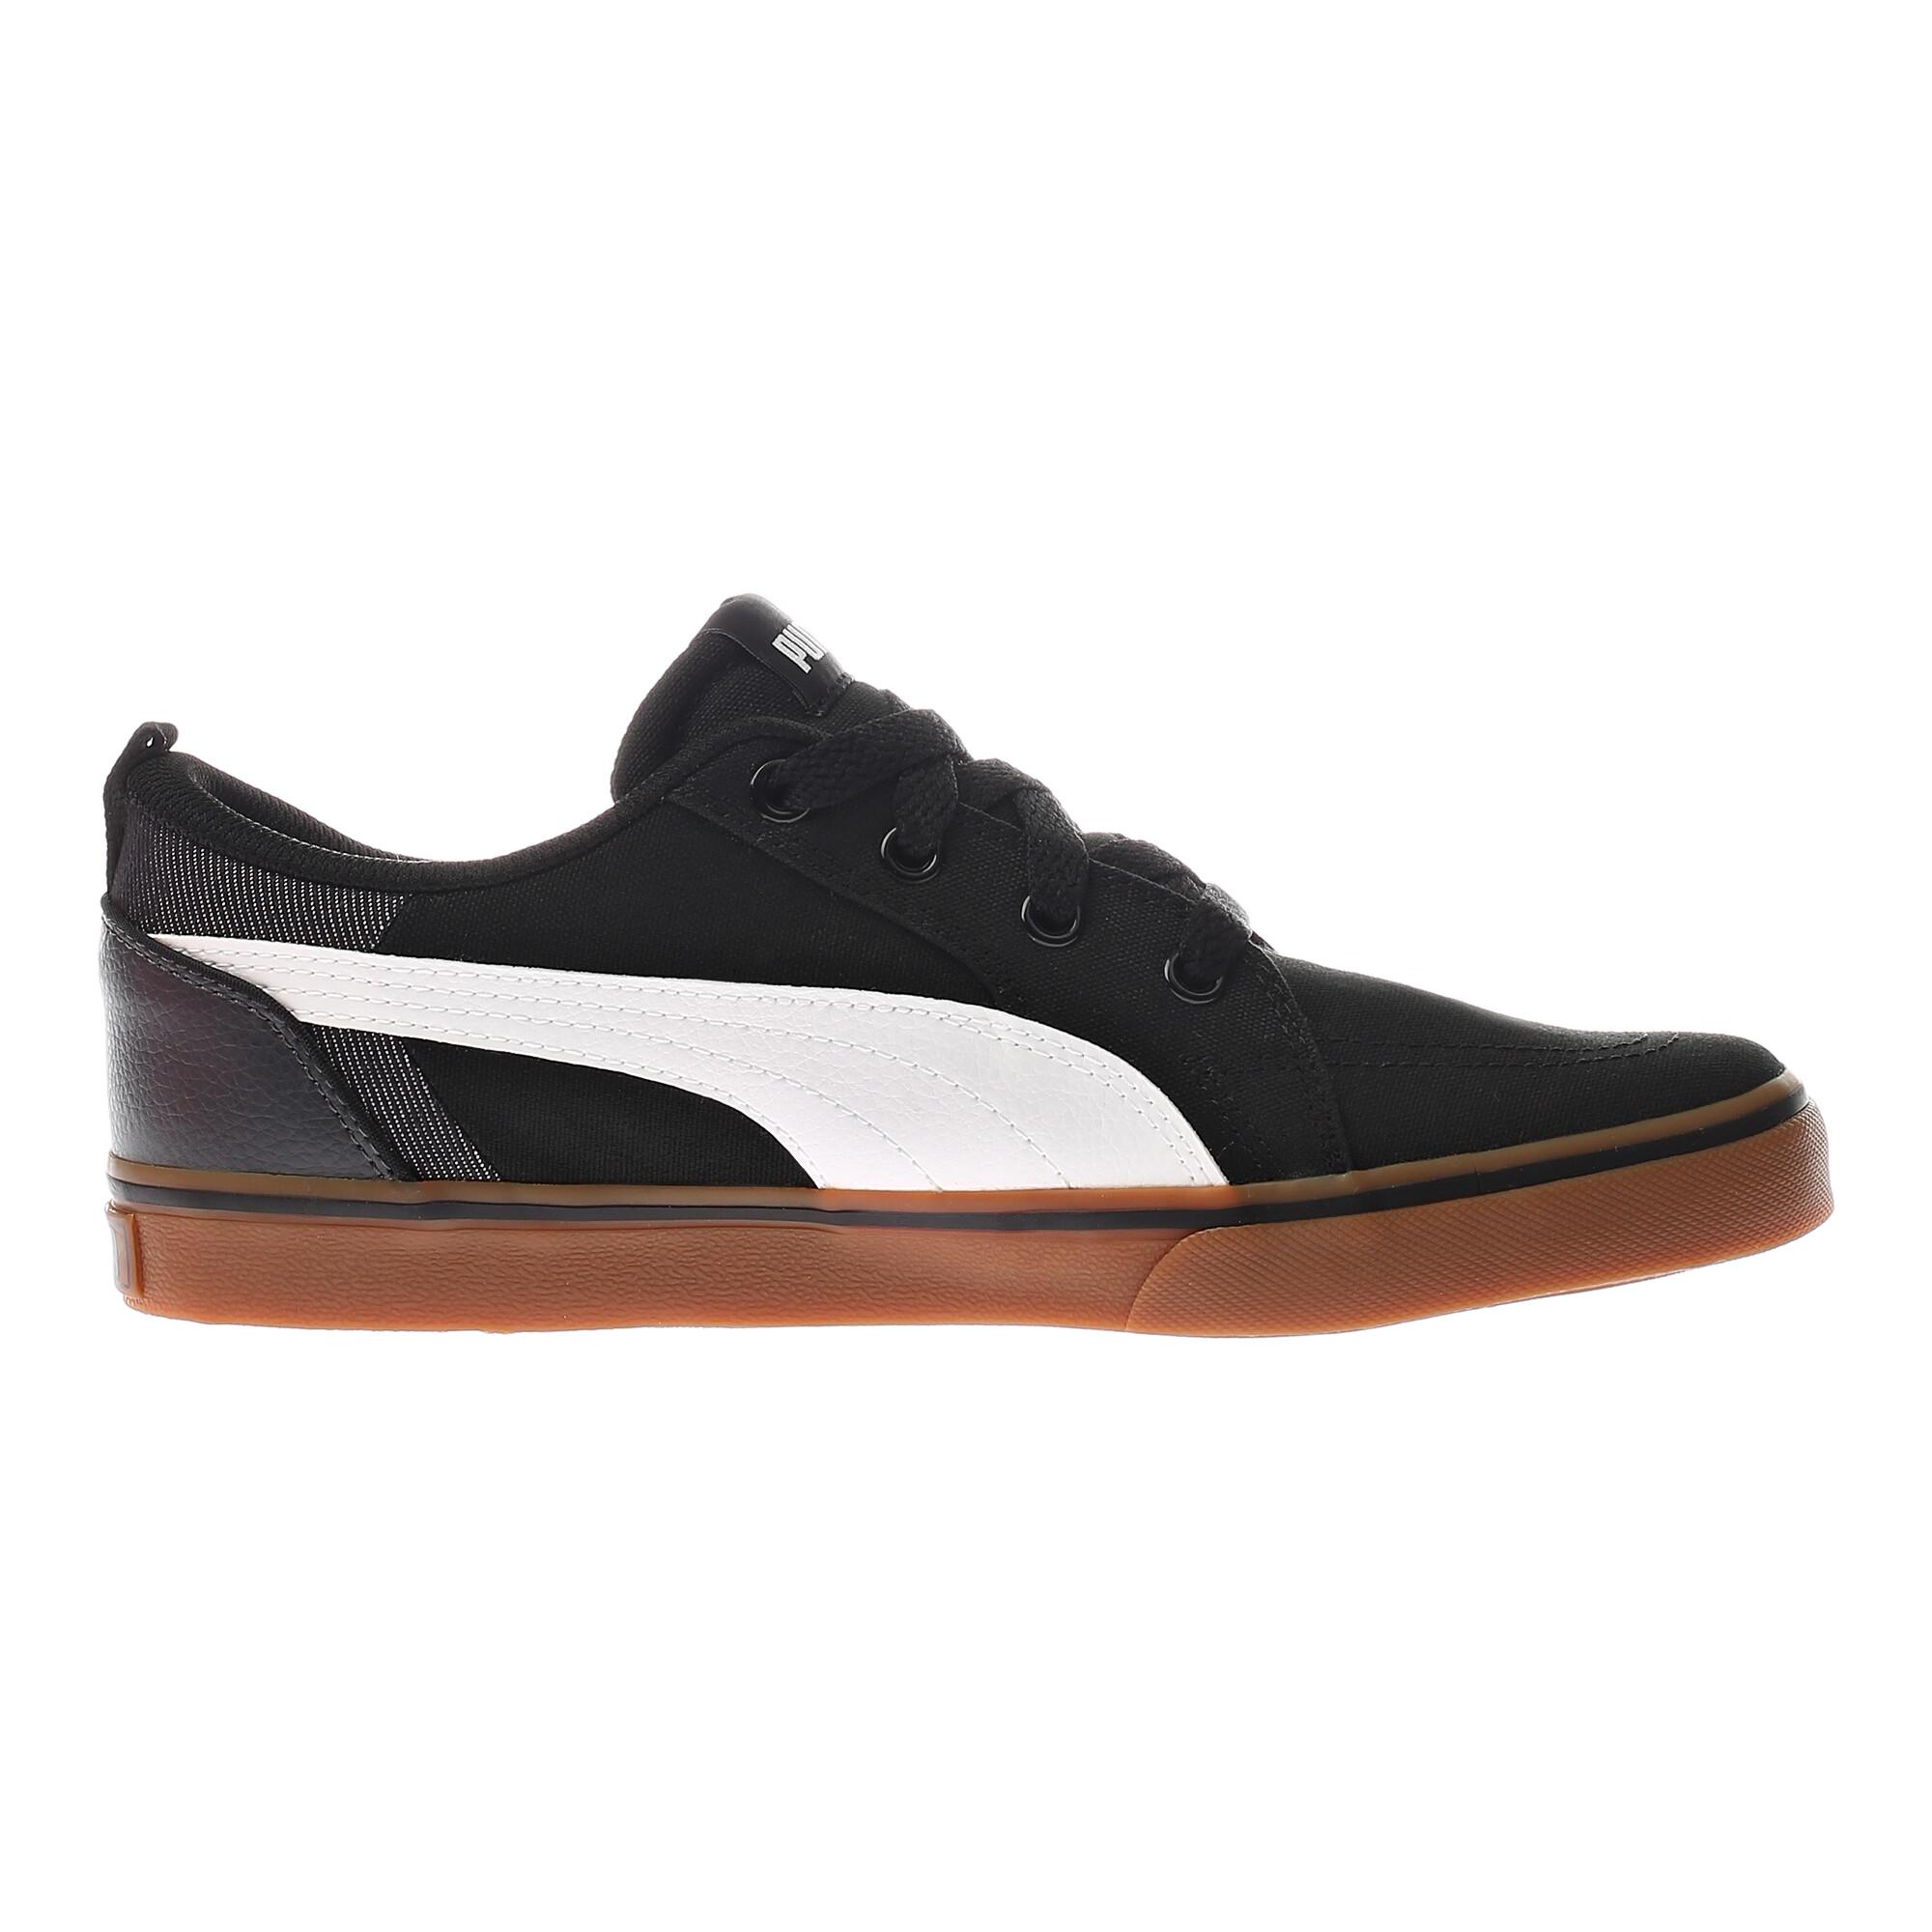 PUMA-PUMA-Bridger-Men-039-s-Sneakers-Men-Shoe-Basics thumbnail 5